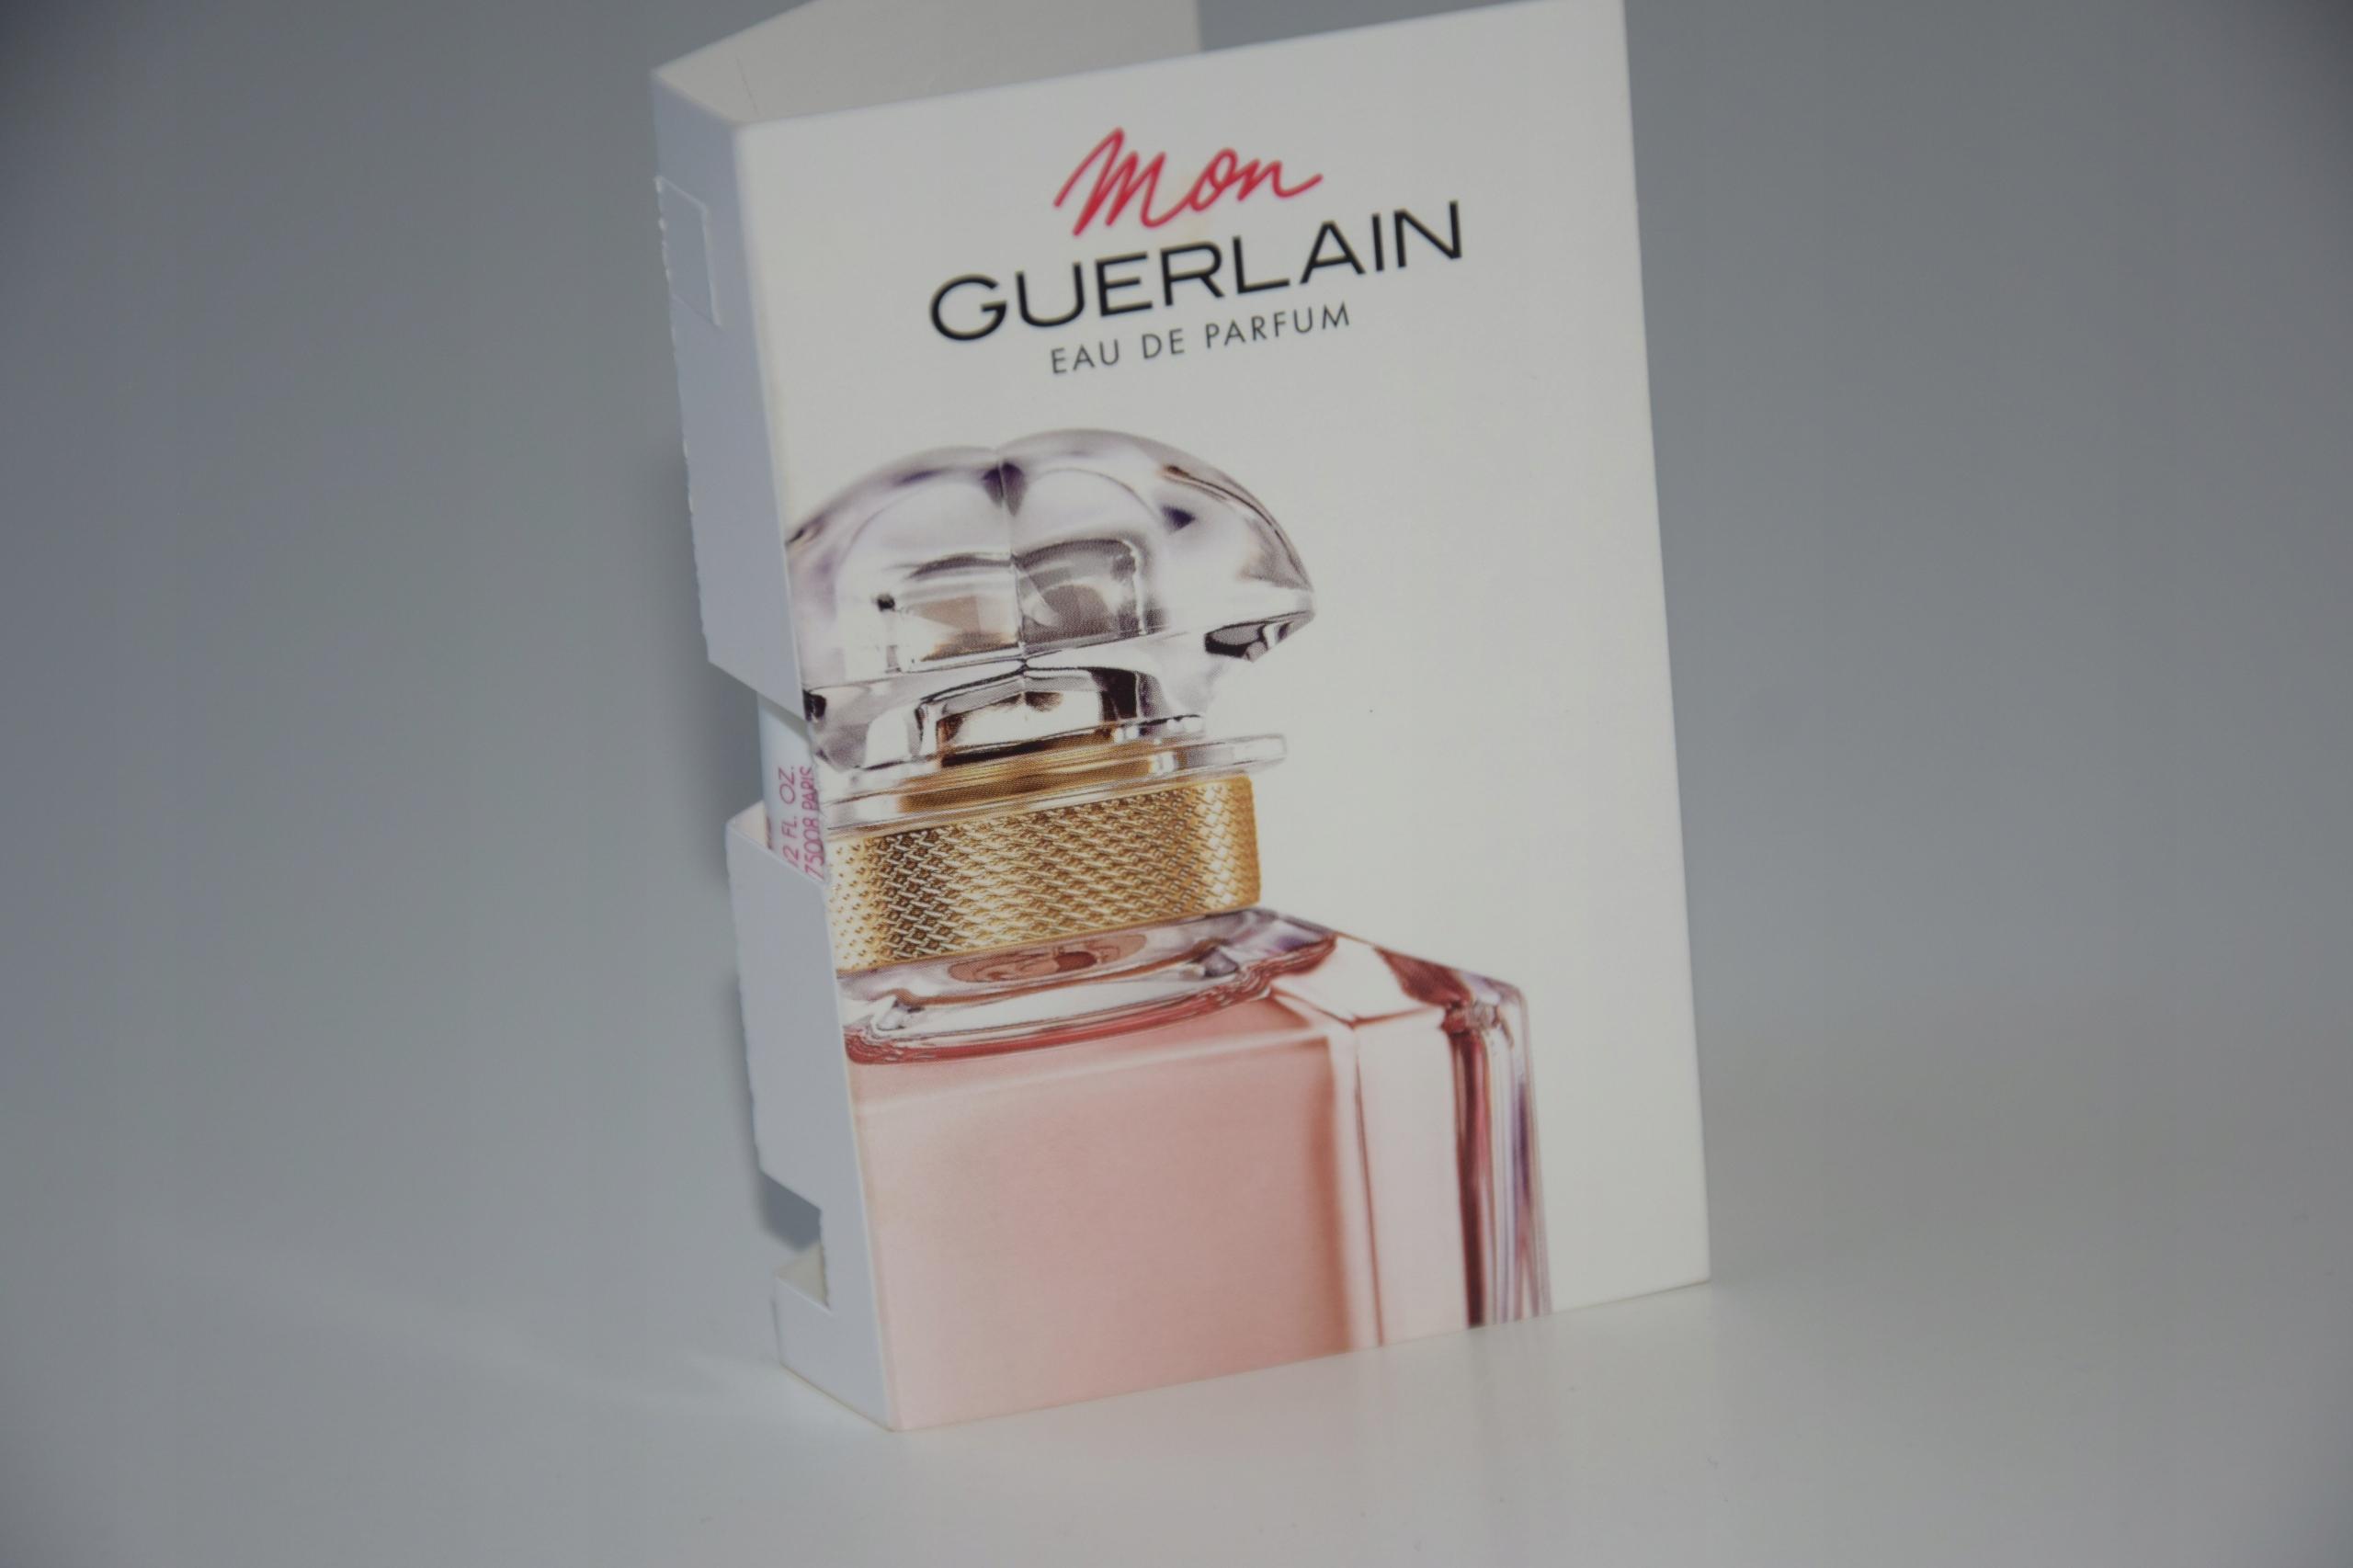 7 Atomizer Woda PerfumGratis Ml 0 Mon Guerlain 3FcTJlK1